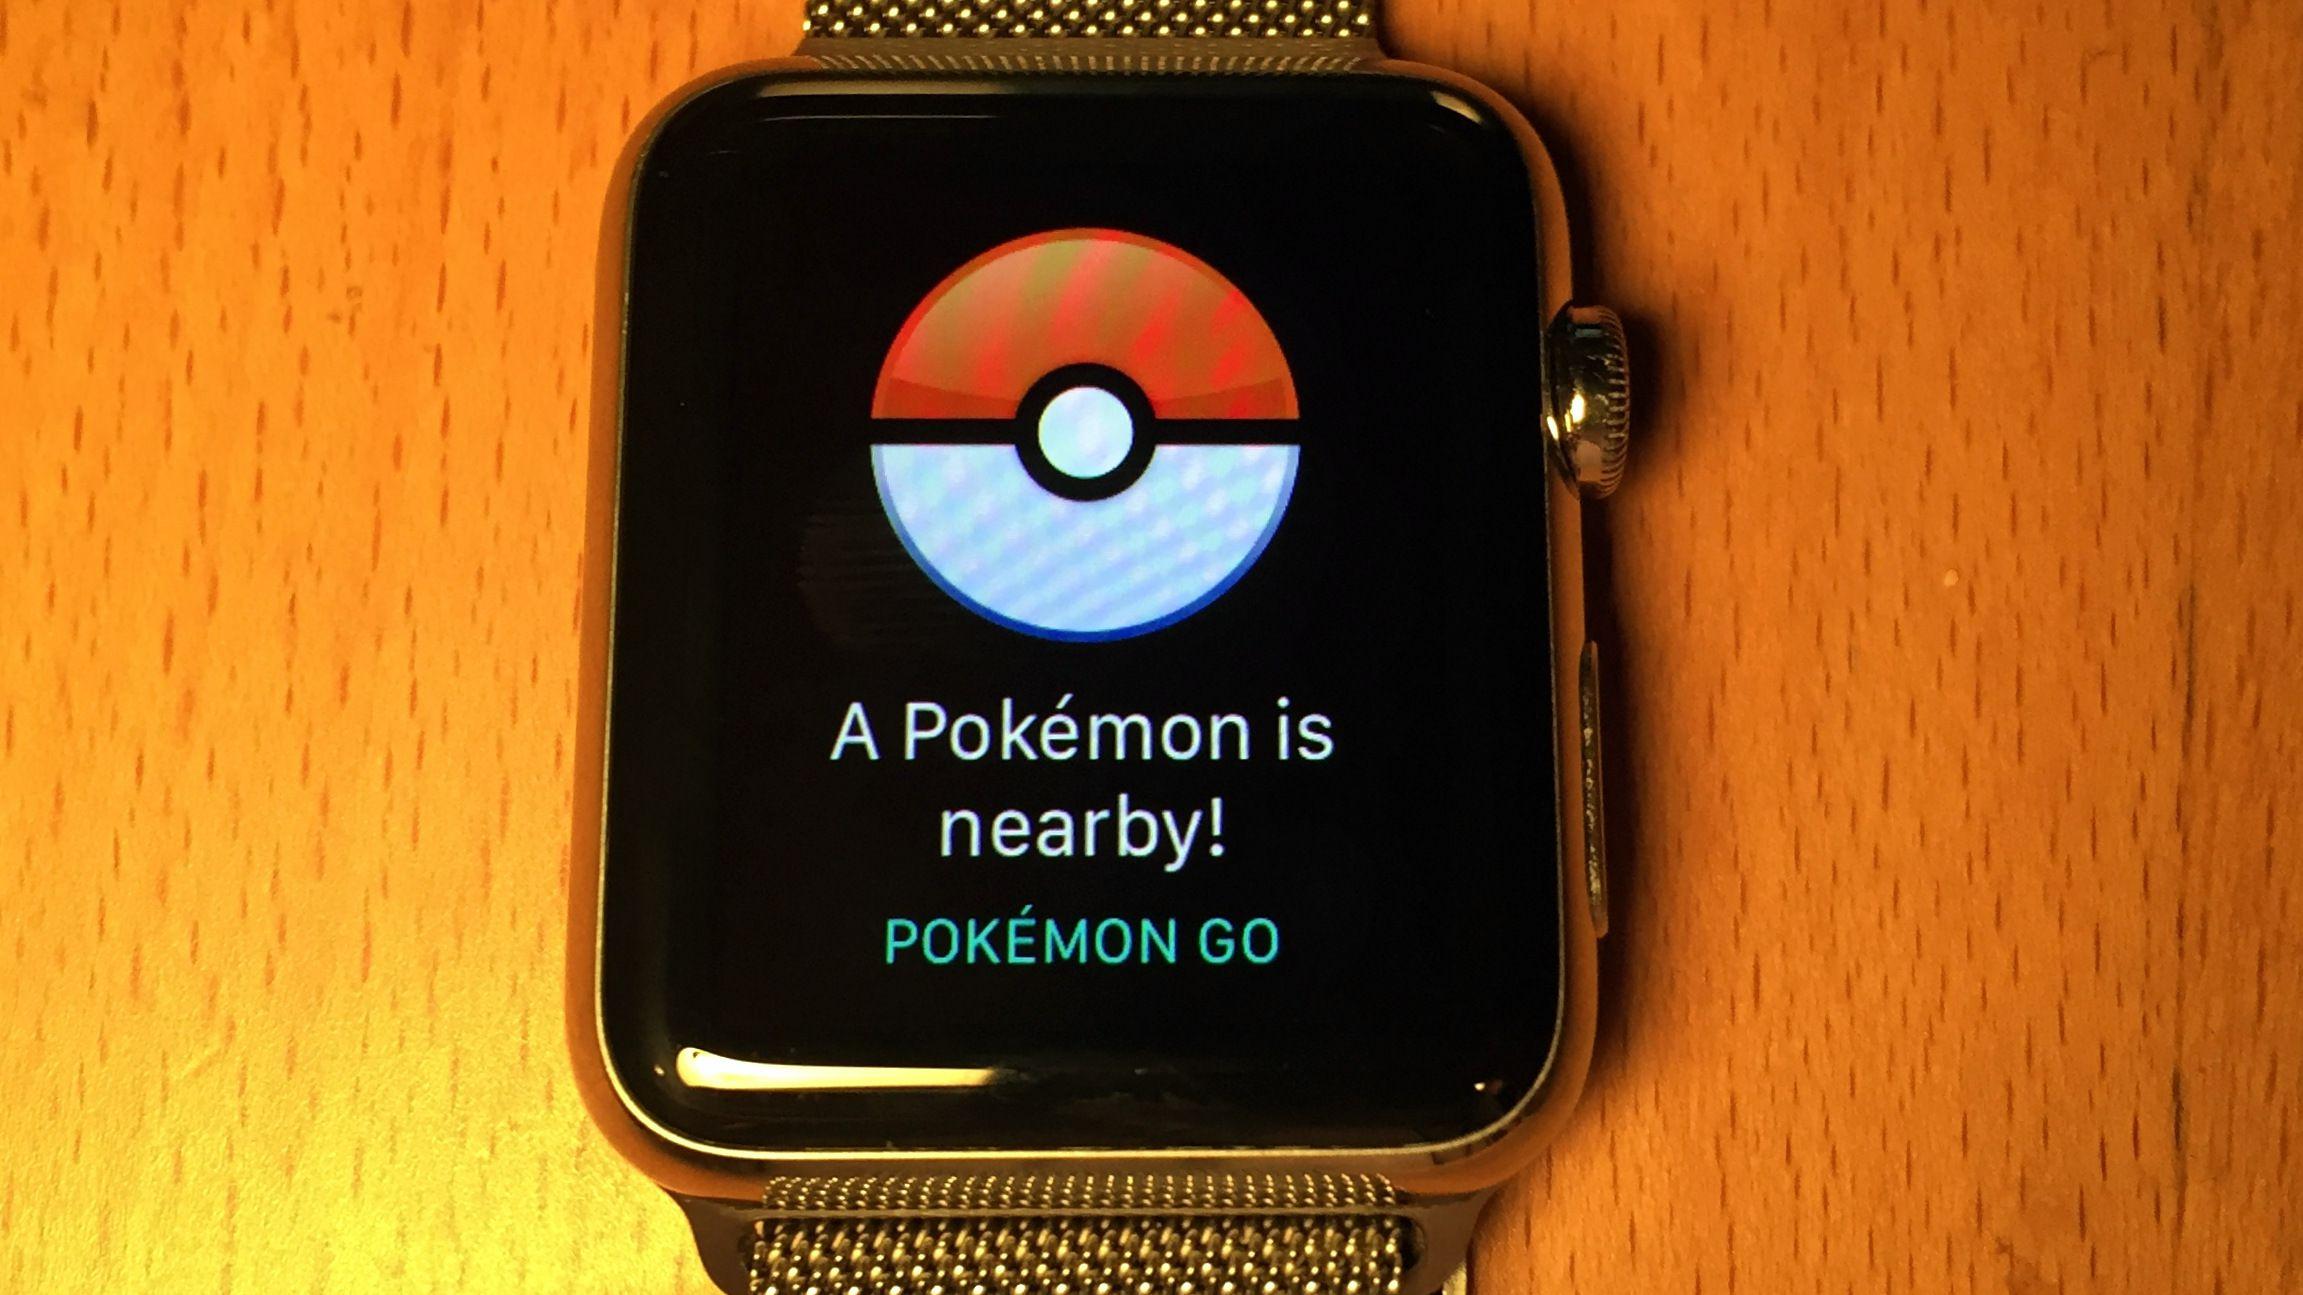 Pokemon Go Apple Watch App Pros and Cons